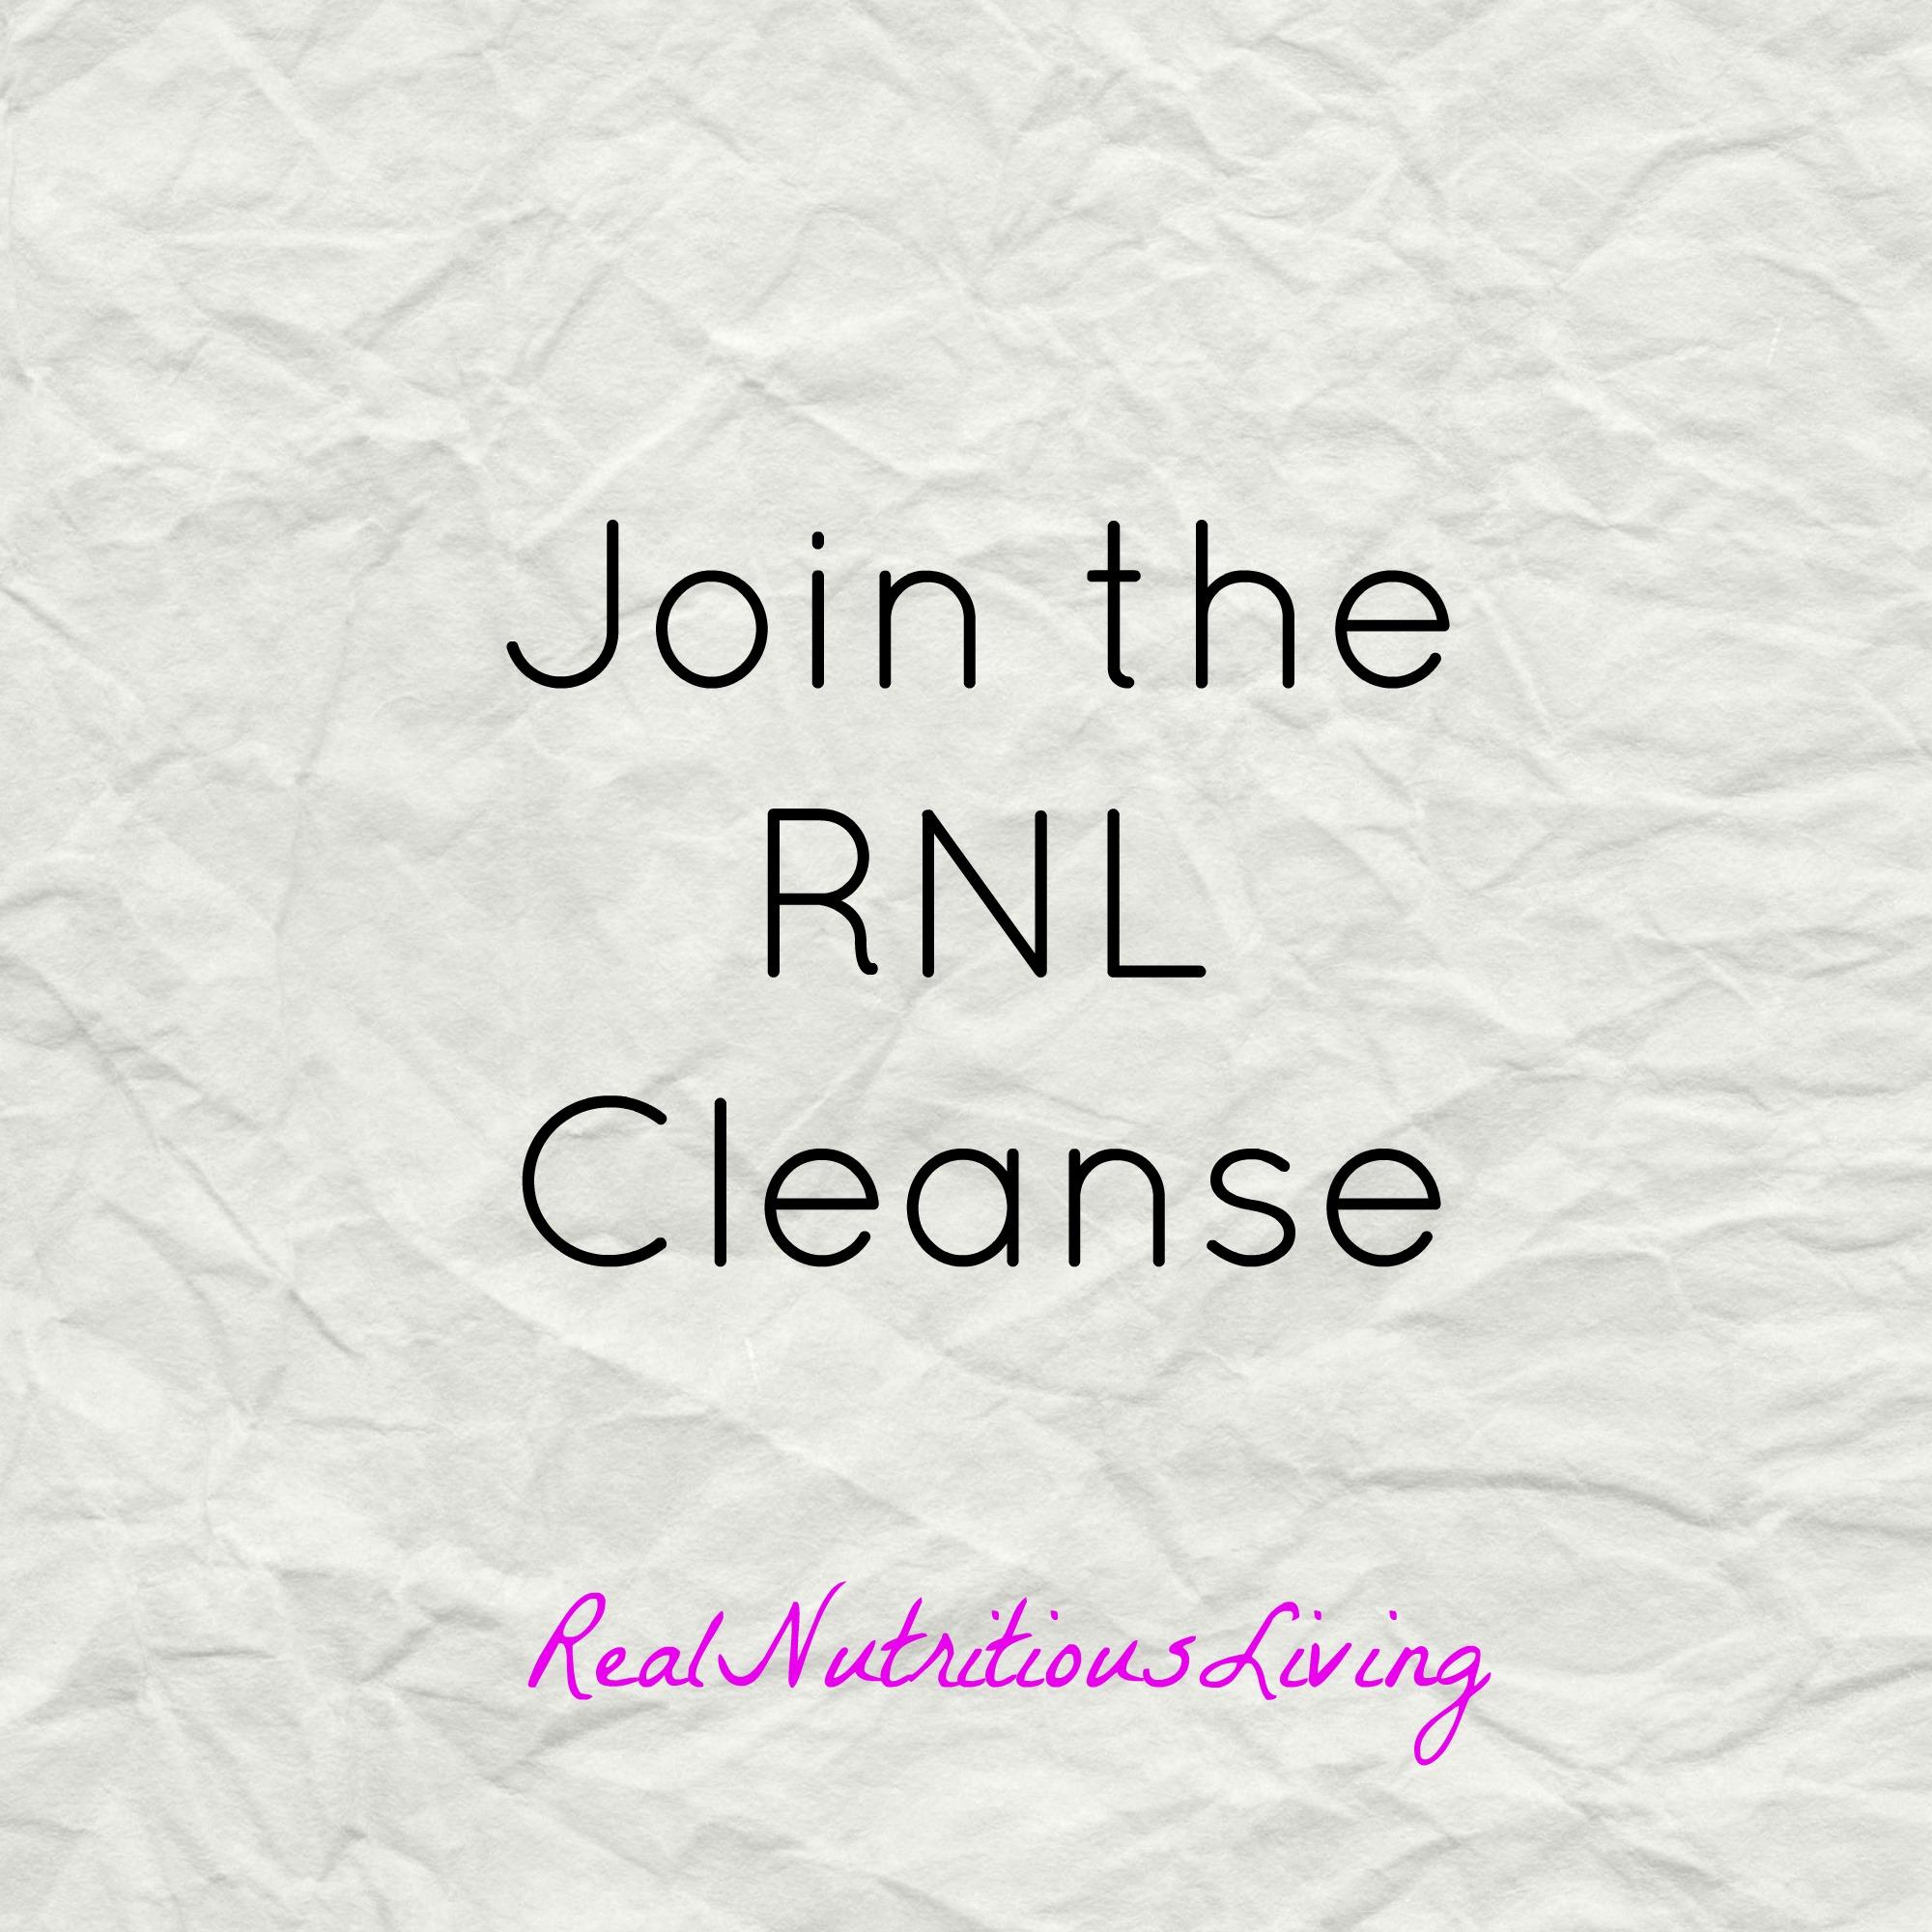 RNL Cleanse